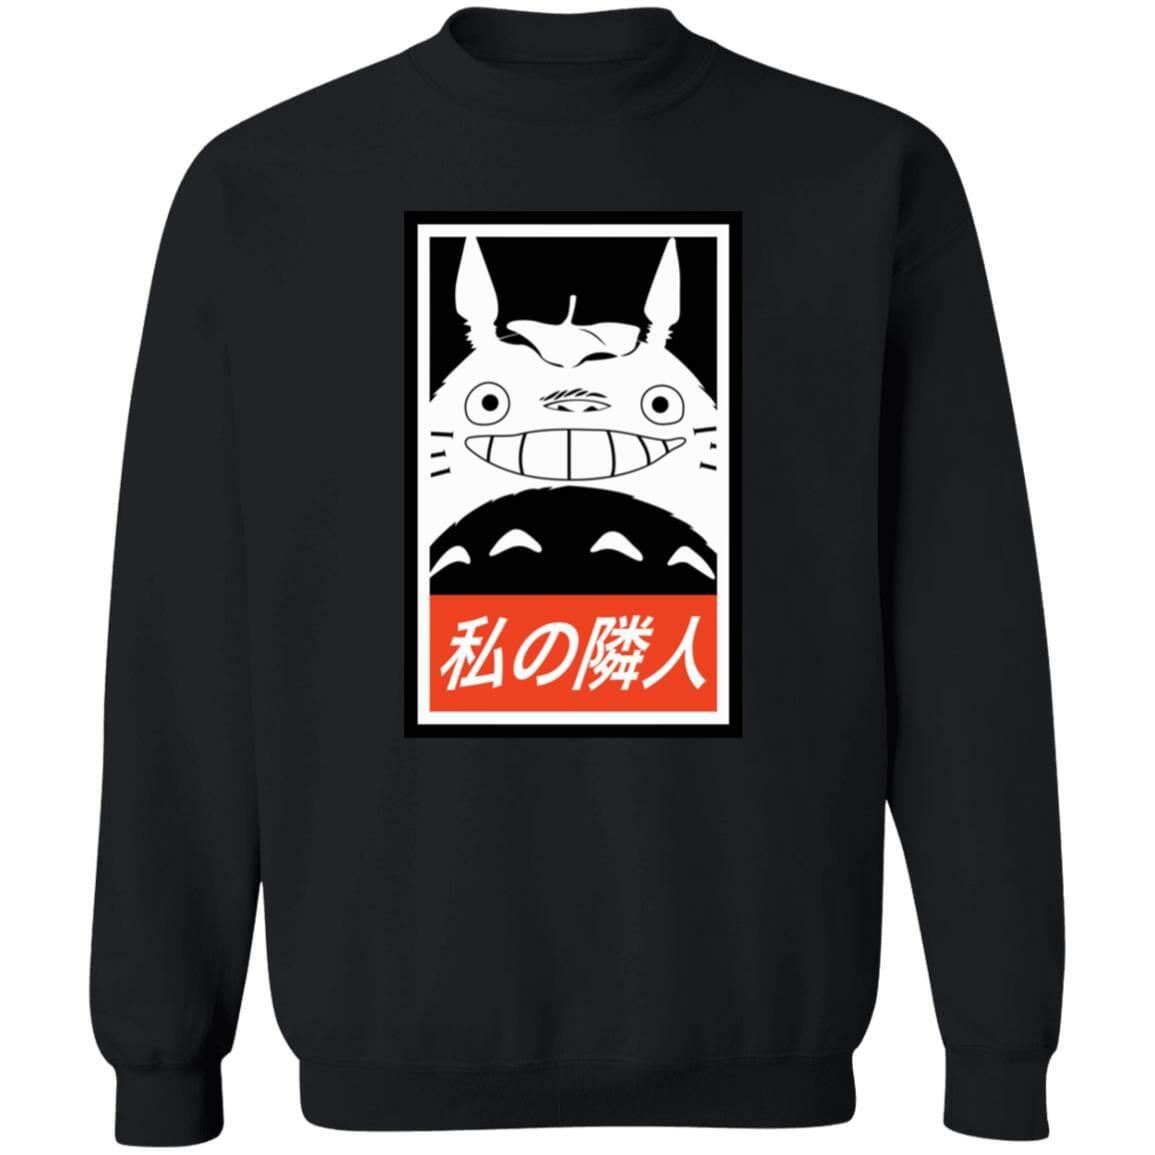 Smiling Totoro Sweatshirt Unisex